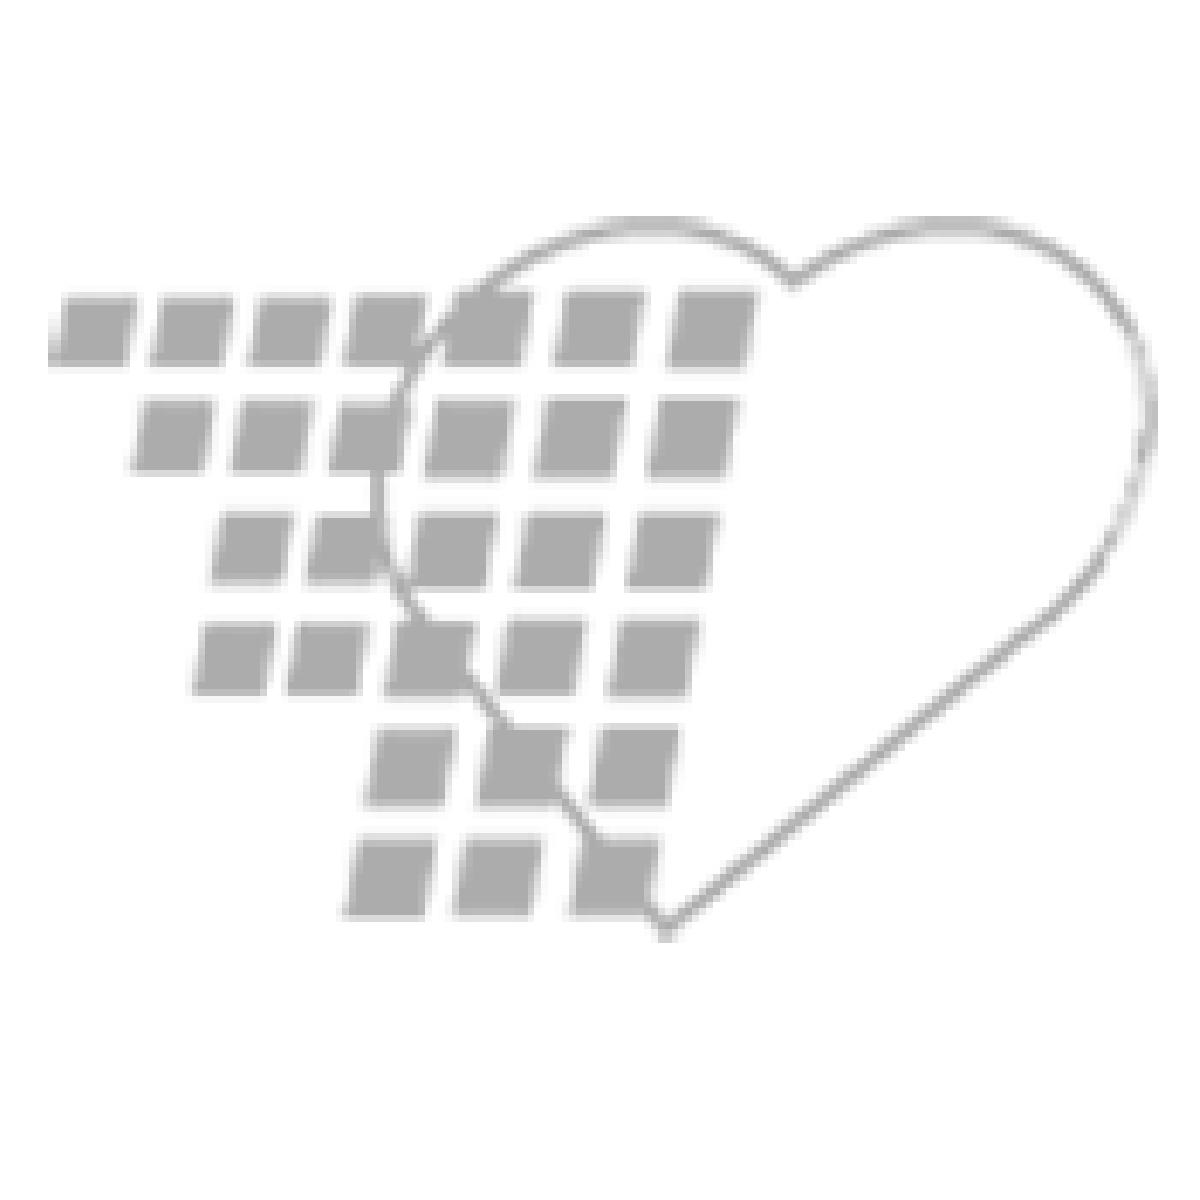 02-38-5160 - Accutrend® Plus Glucose Test Strips